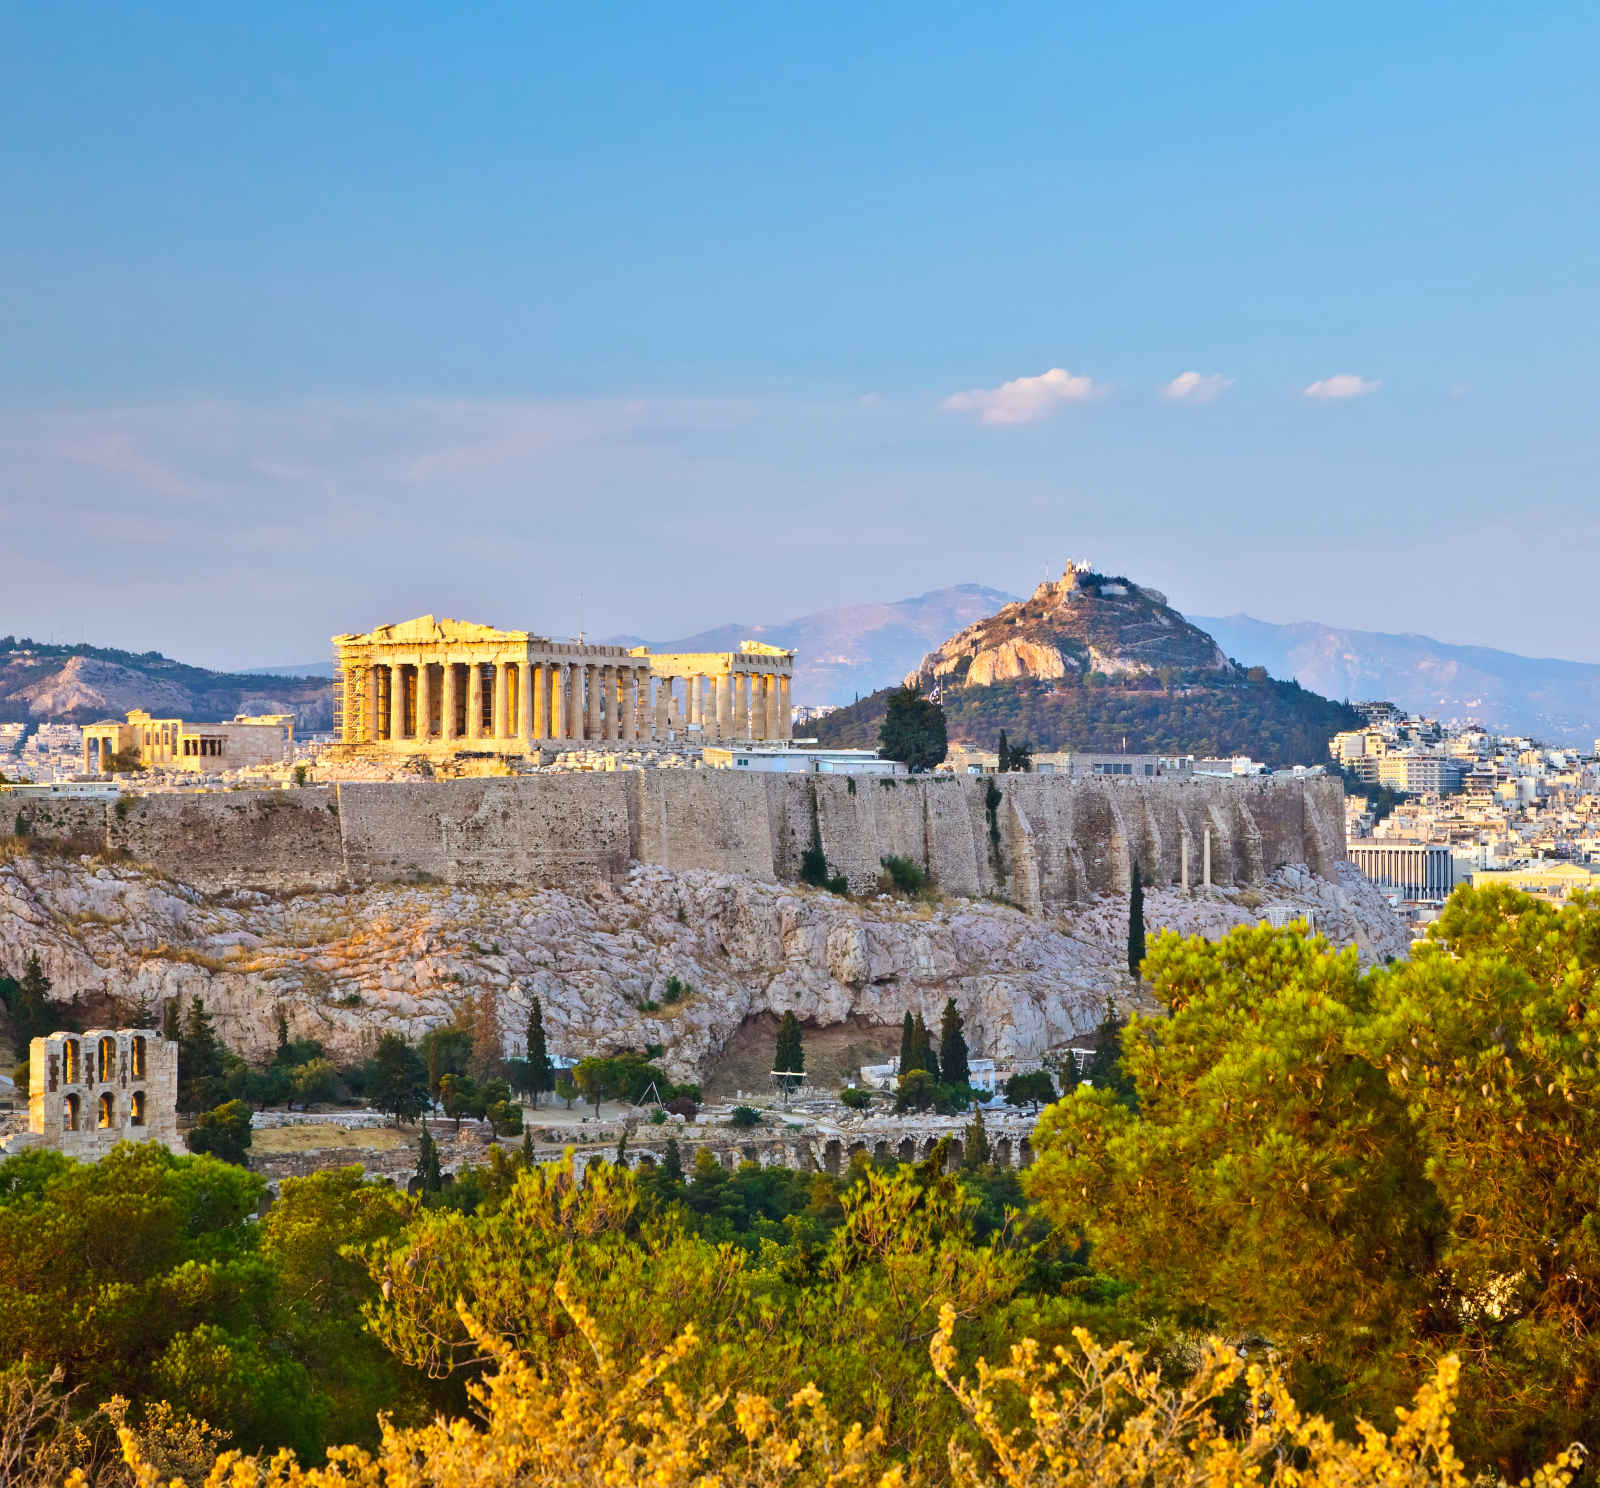 Grèce : Grand tour de Grèce